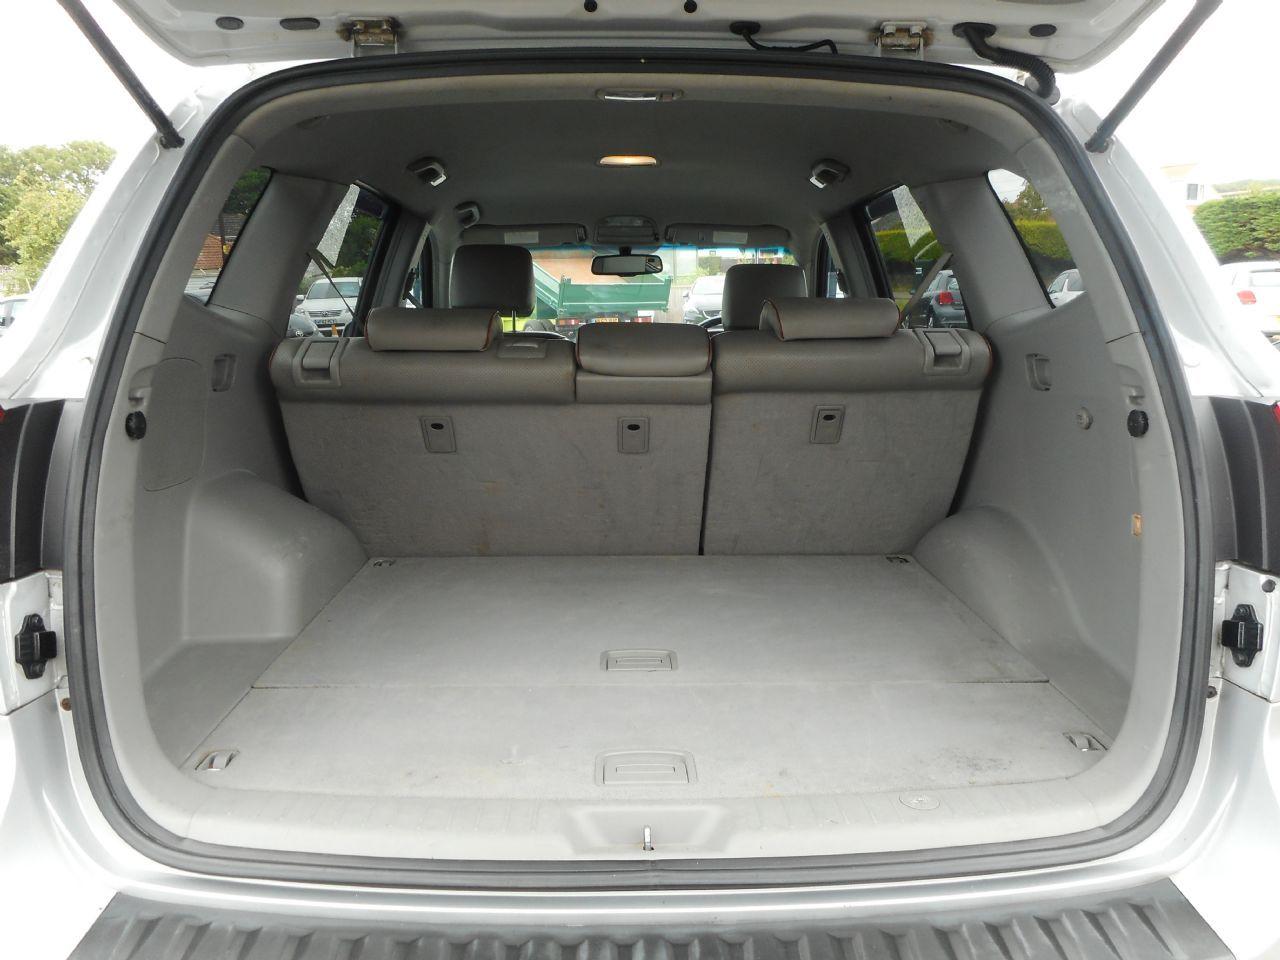 HYUNDAI Santa Fe 2.2 CRTD CDX 5 Seat EU4 (2008) - Picture 15